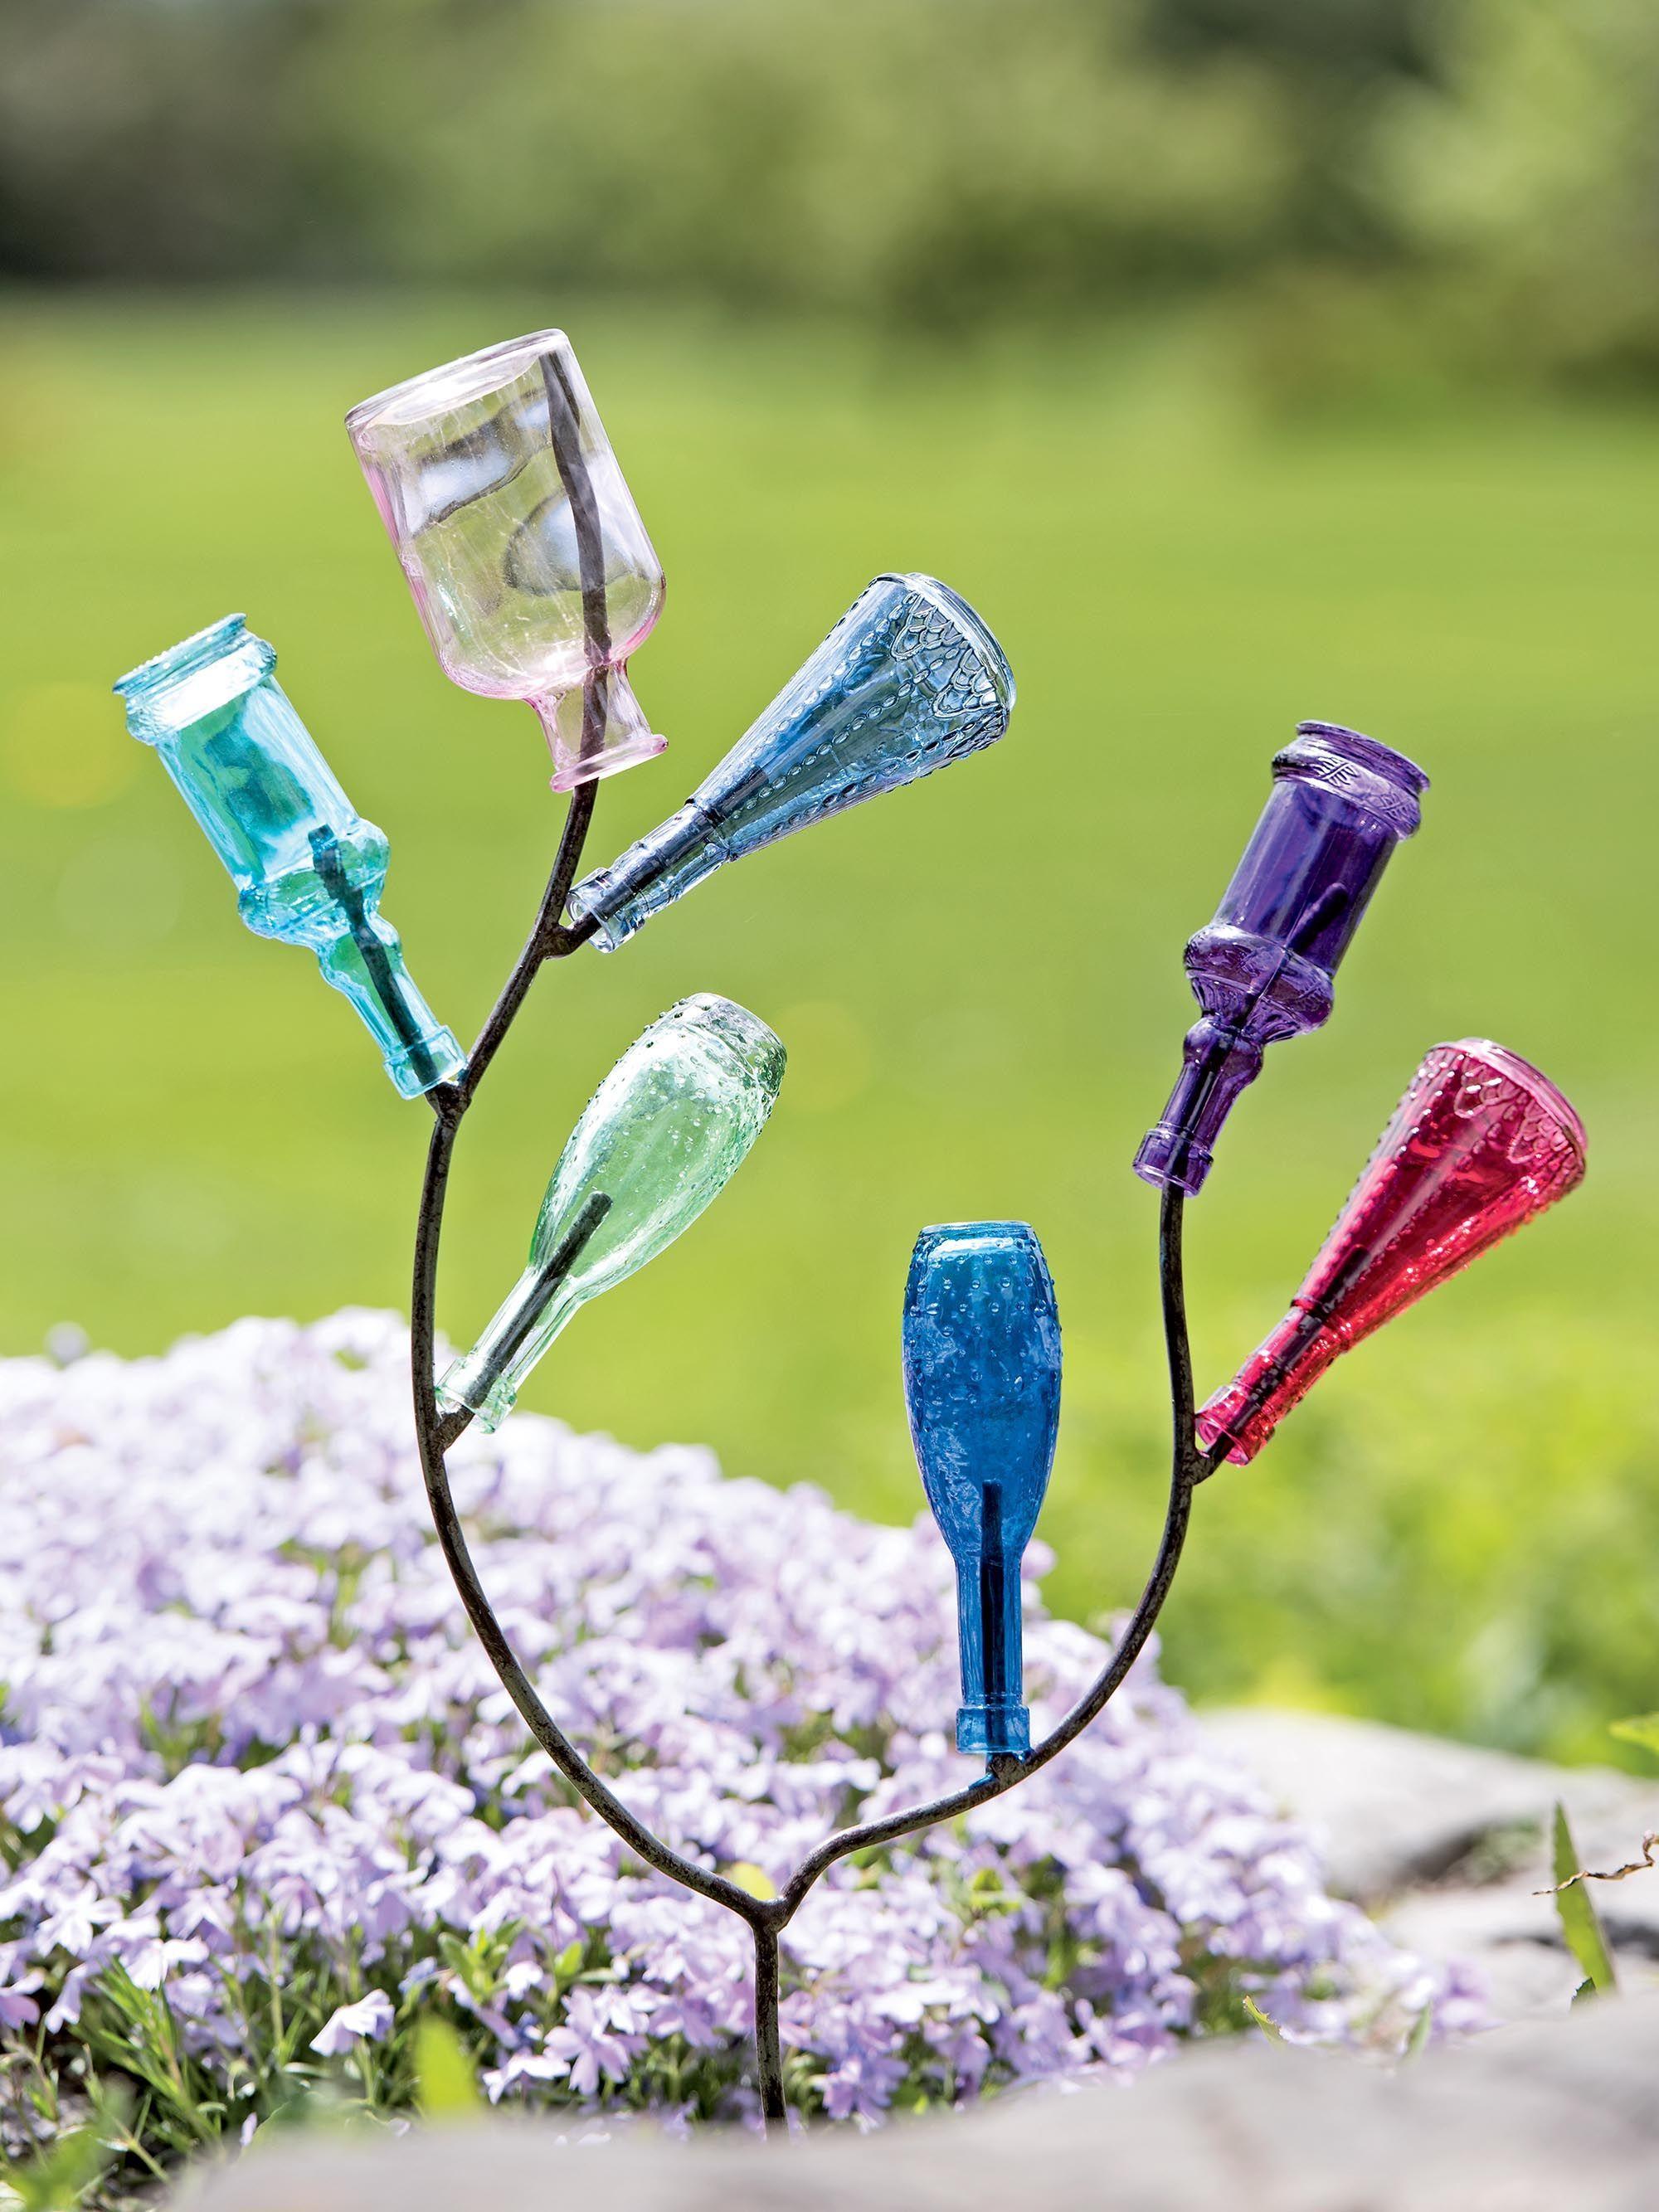 Mini Bottle Tree - Bottle Tree - Small Bottle Tree | Crafts ...